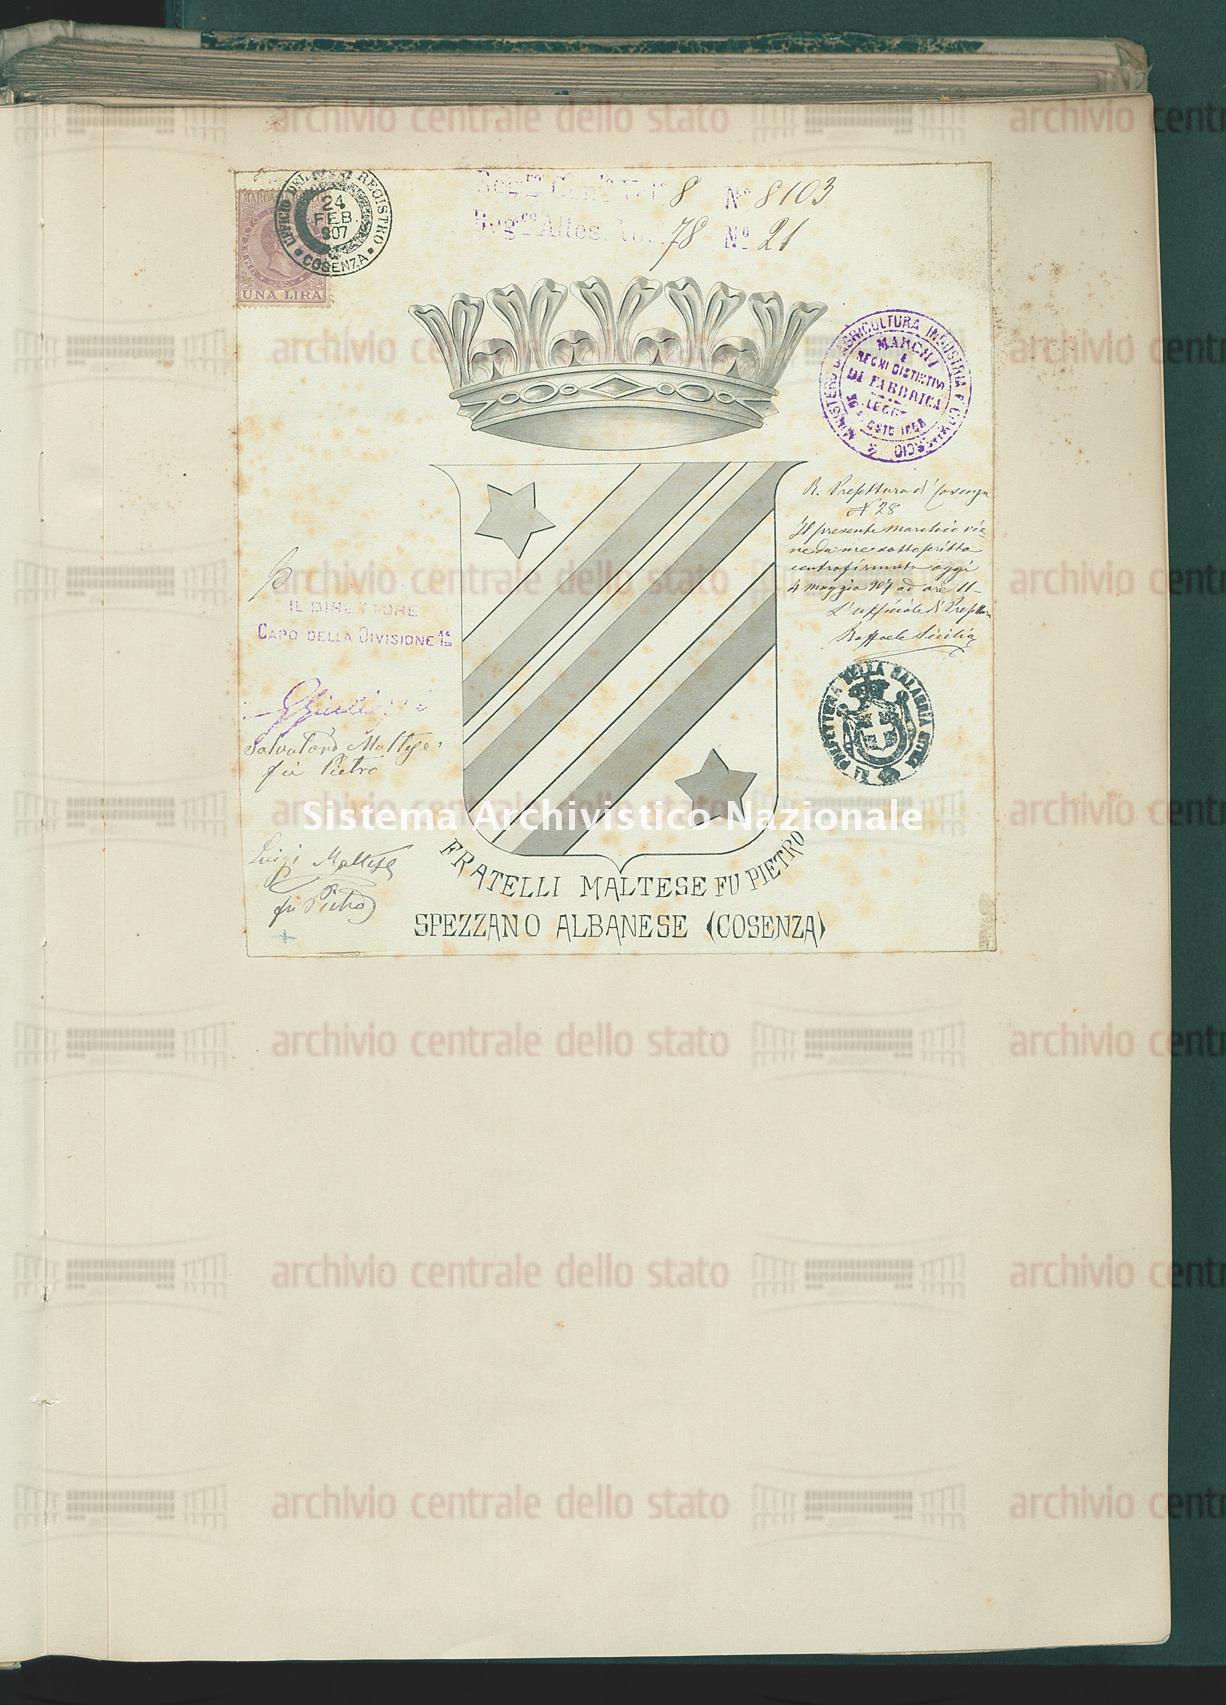 Maltese Salvatore E Maltese Luigi Fratelli (08/11/1907)